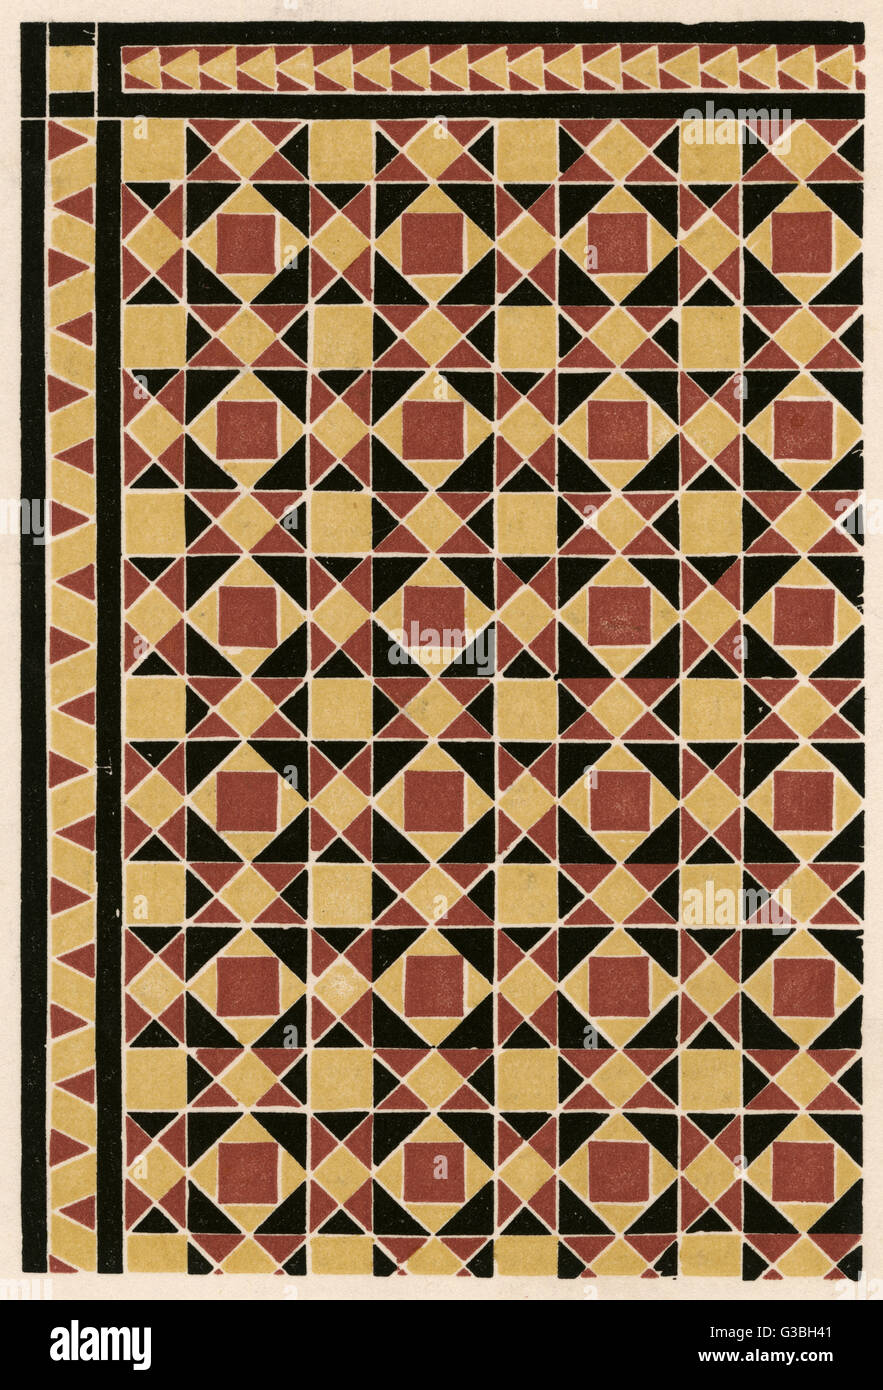 Dating minton tiles